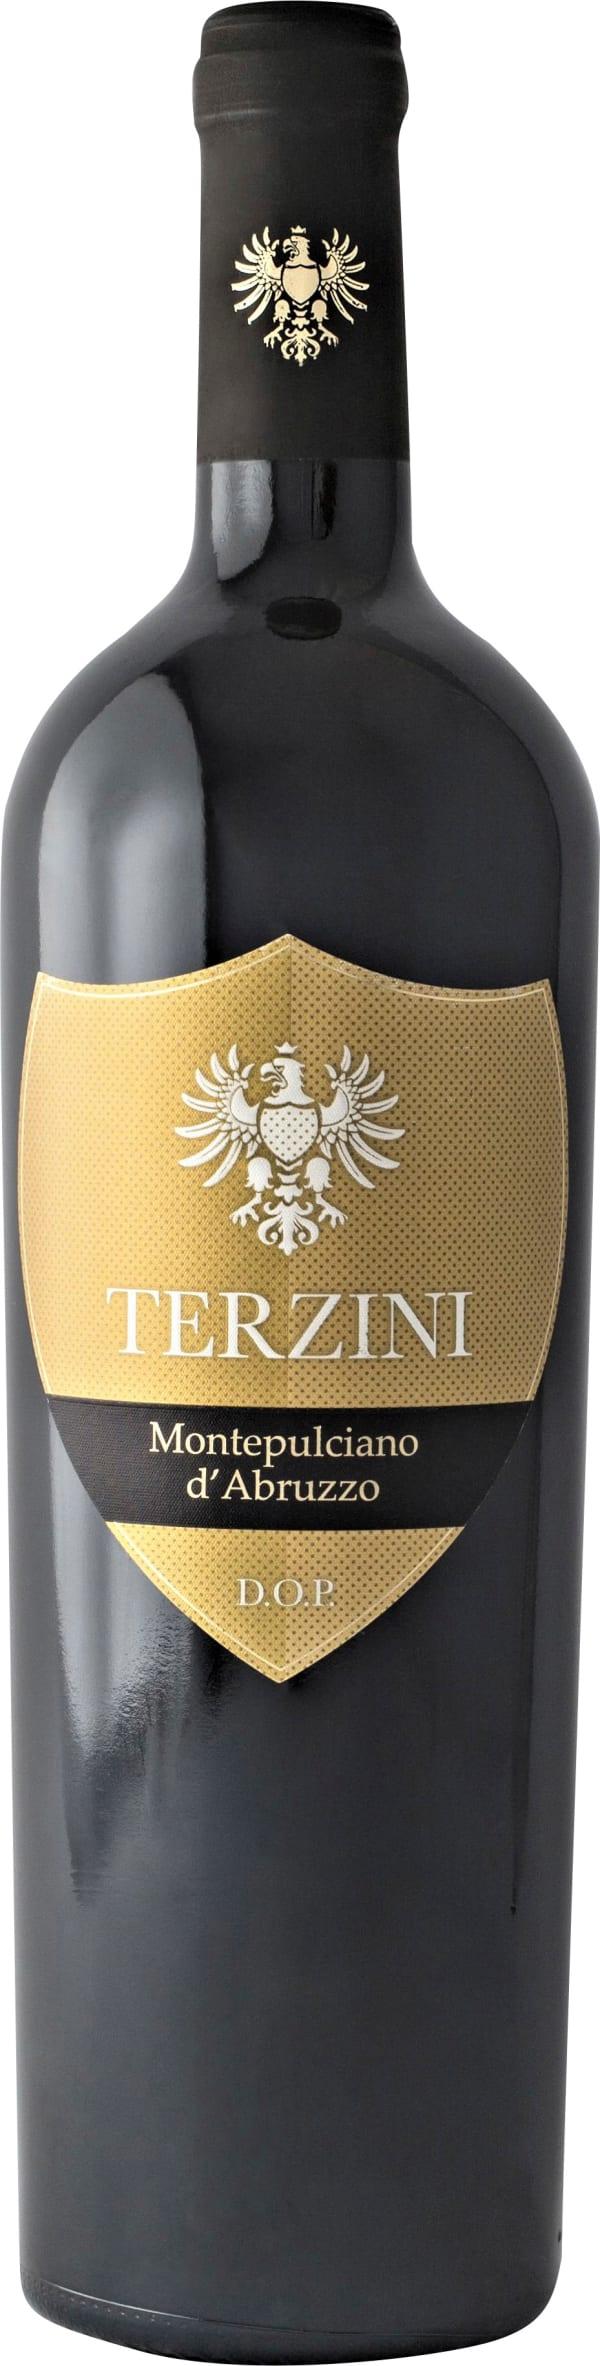 Terzini Montepulciano d'Abruzzo 2015